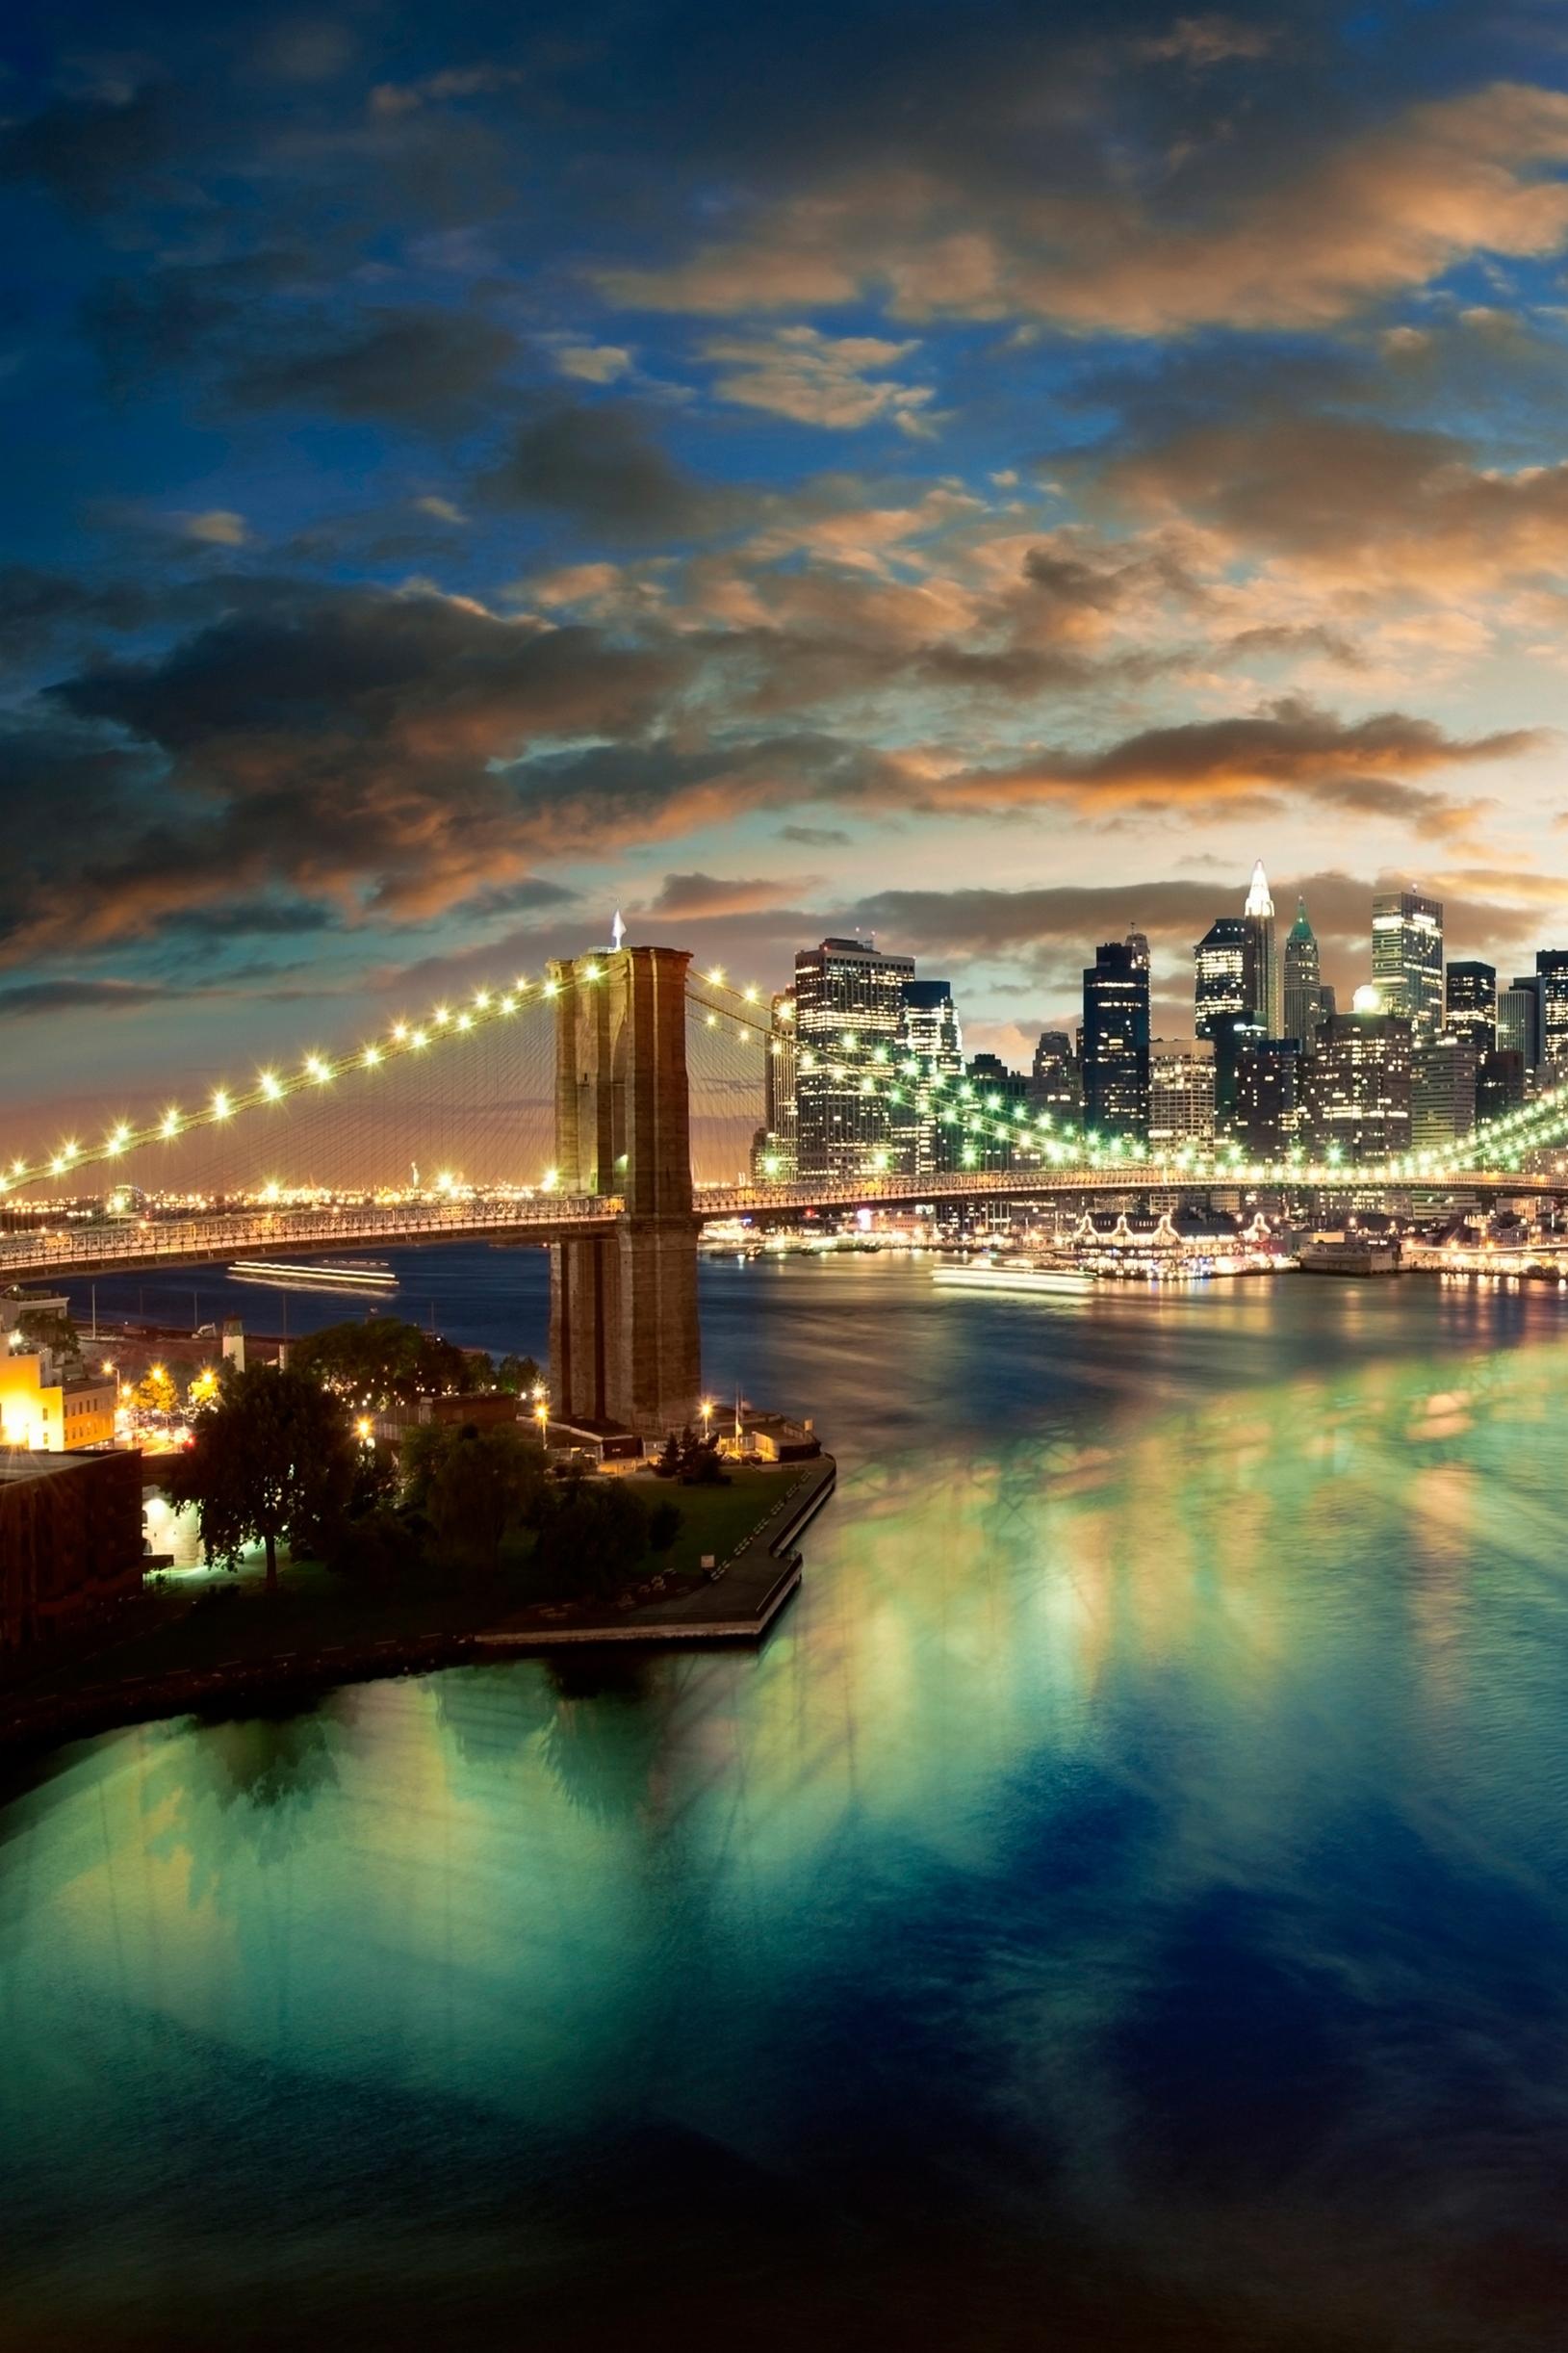 nyc city cityscape urban building skyline bridge river night retina